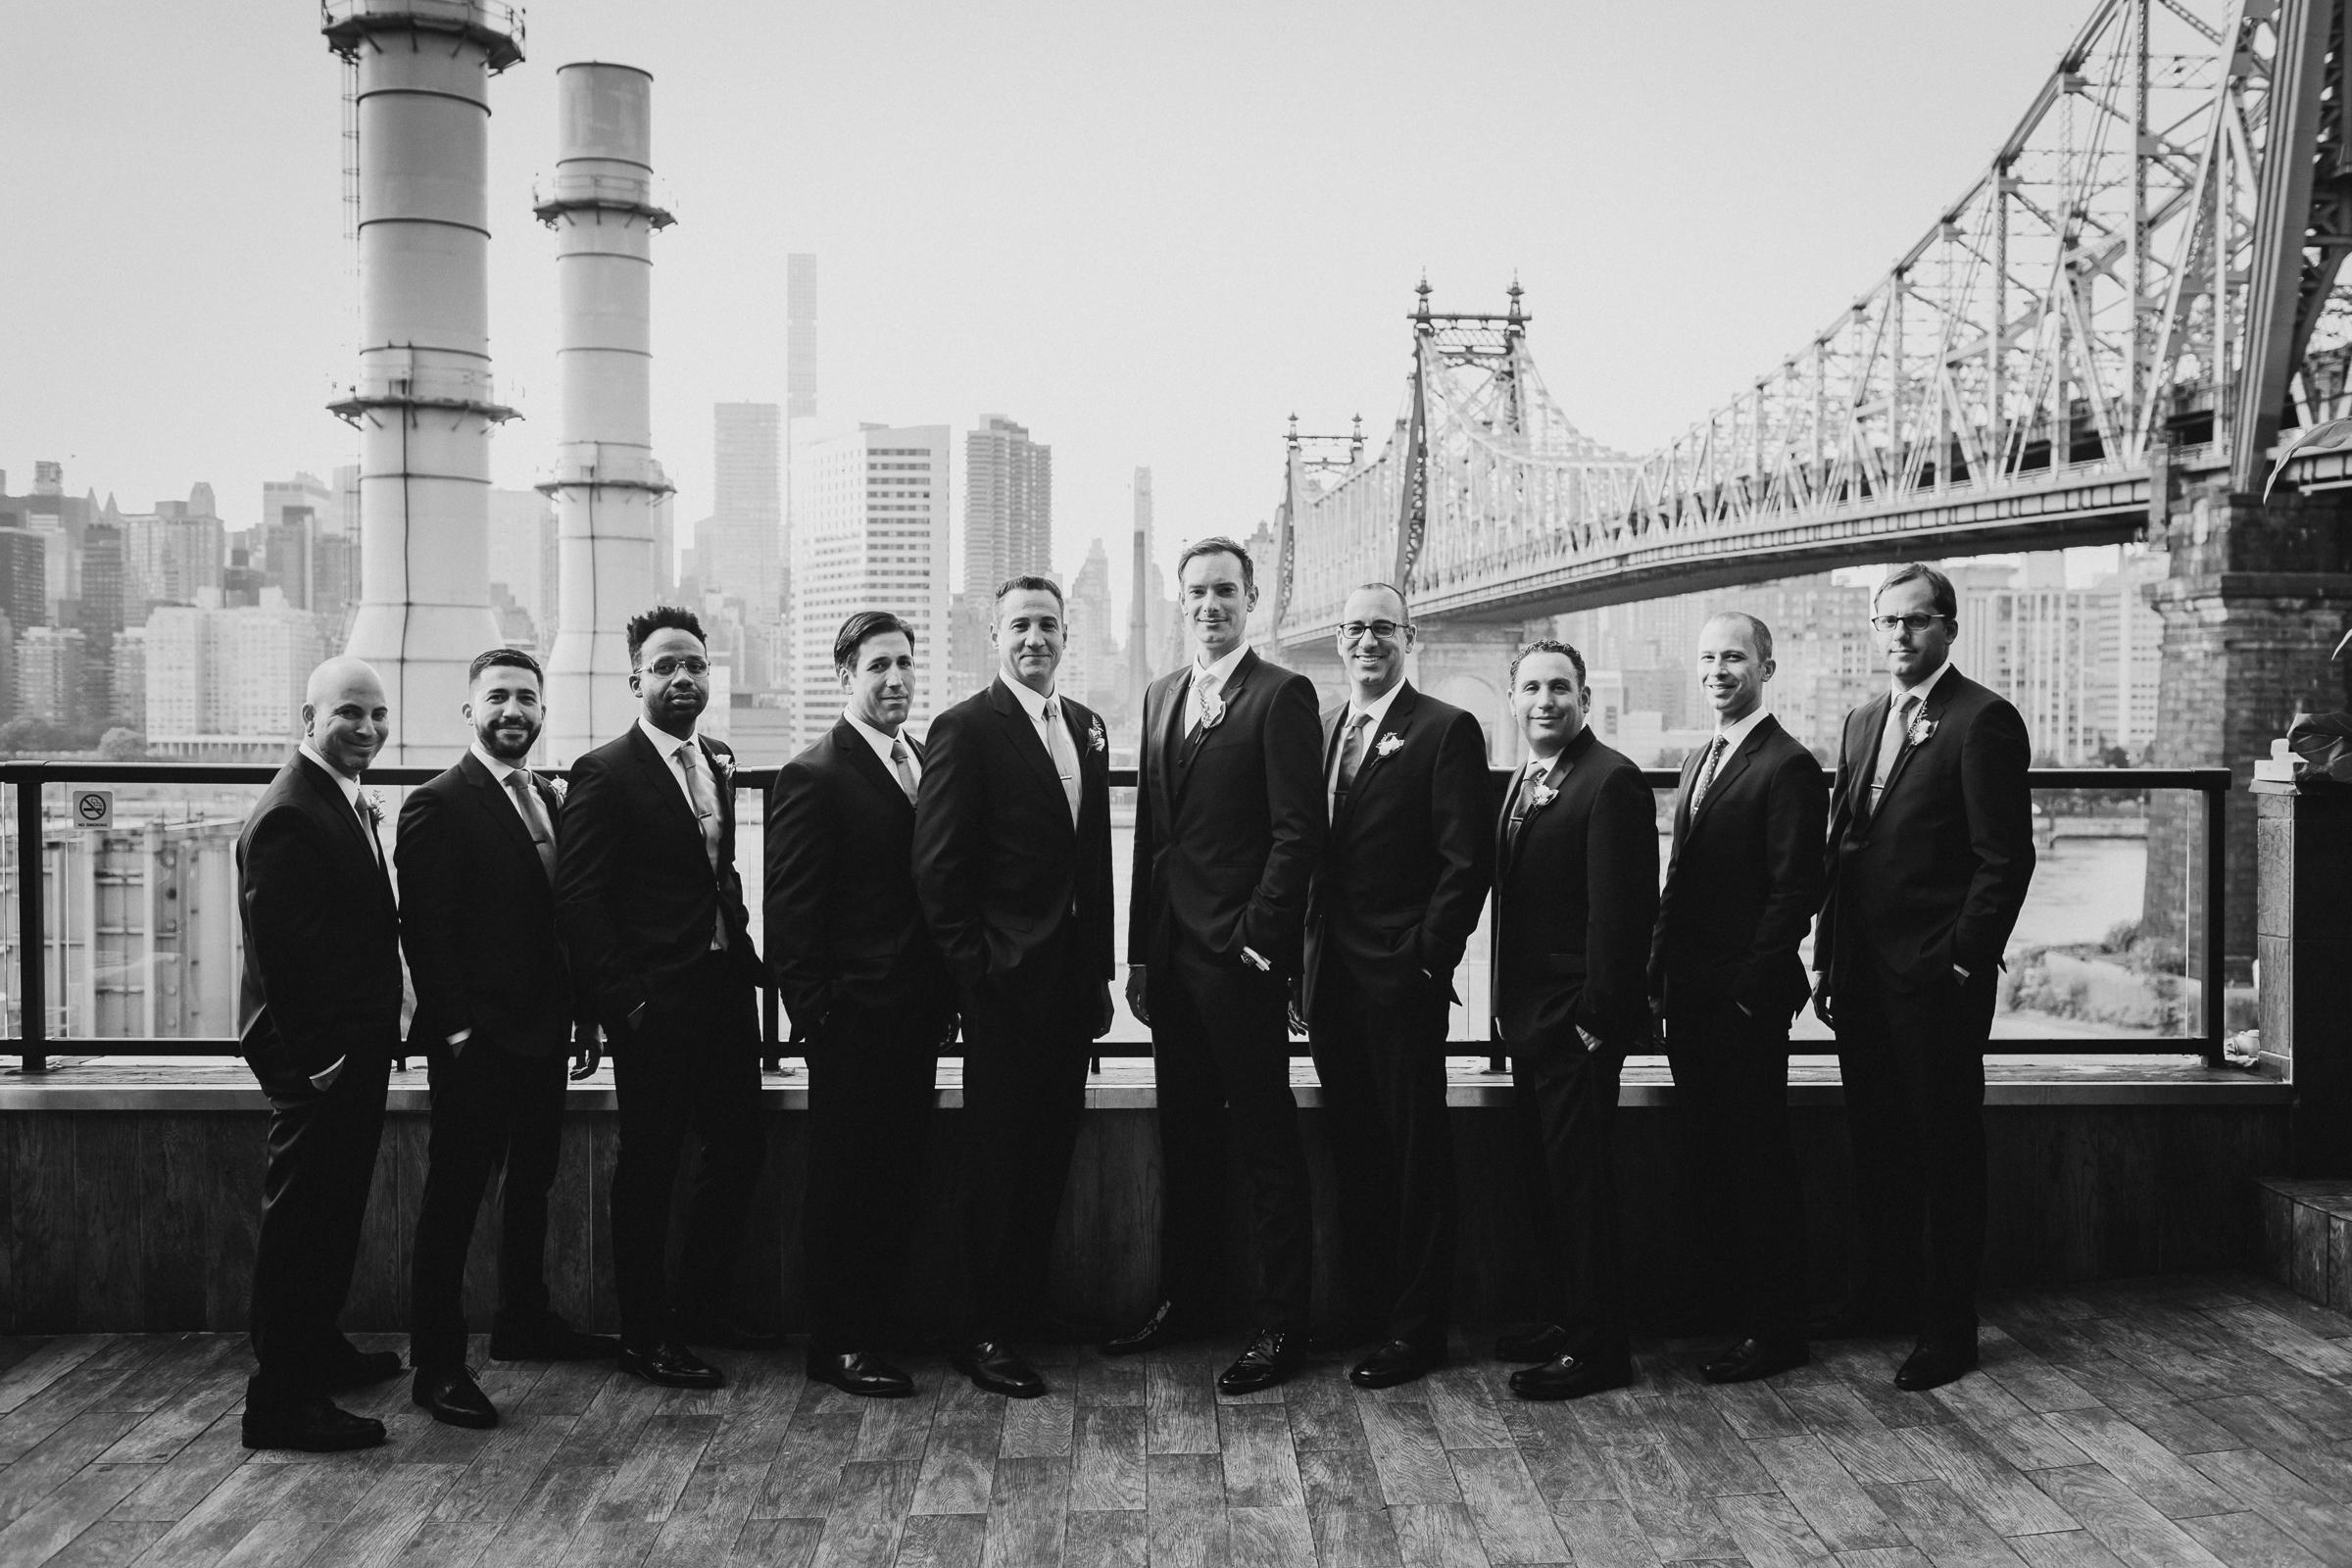 Ravel-Hotel-Penthouse-808-Long-Island-City-New-York-Documentary-Wedding-Photographer-49.jpg